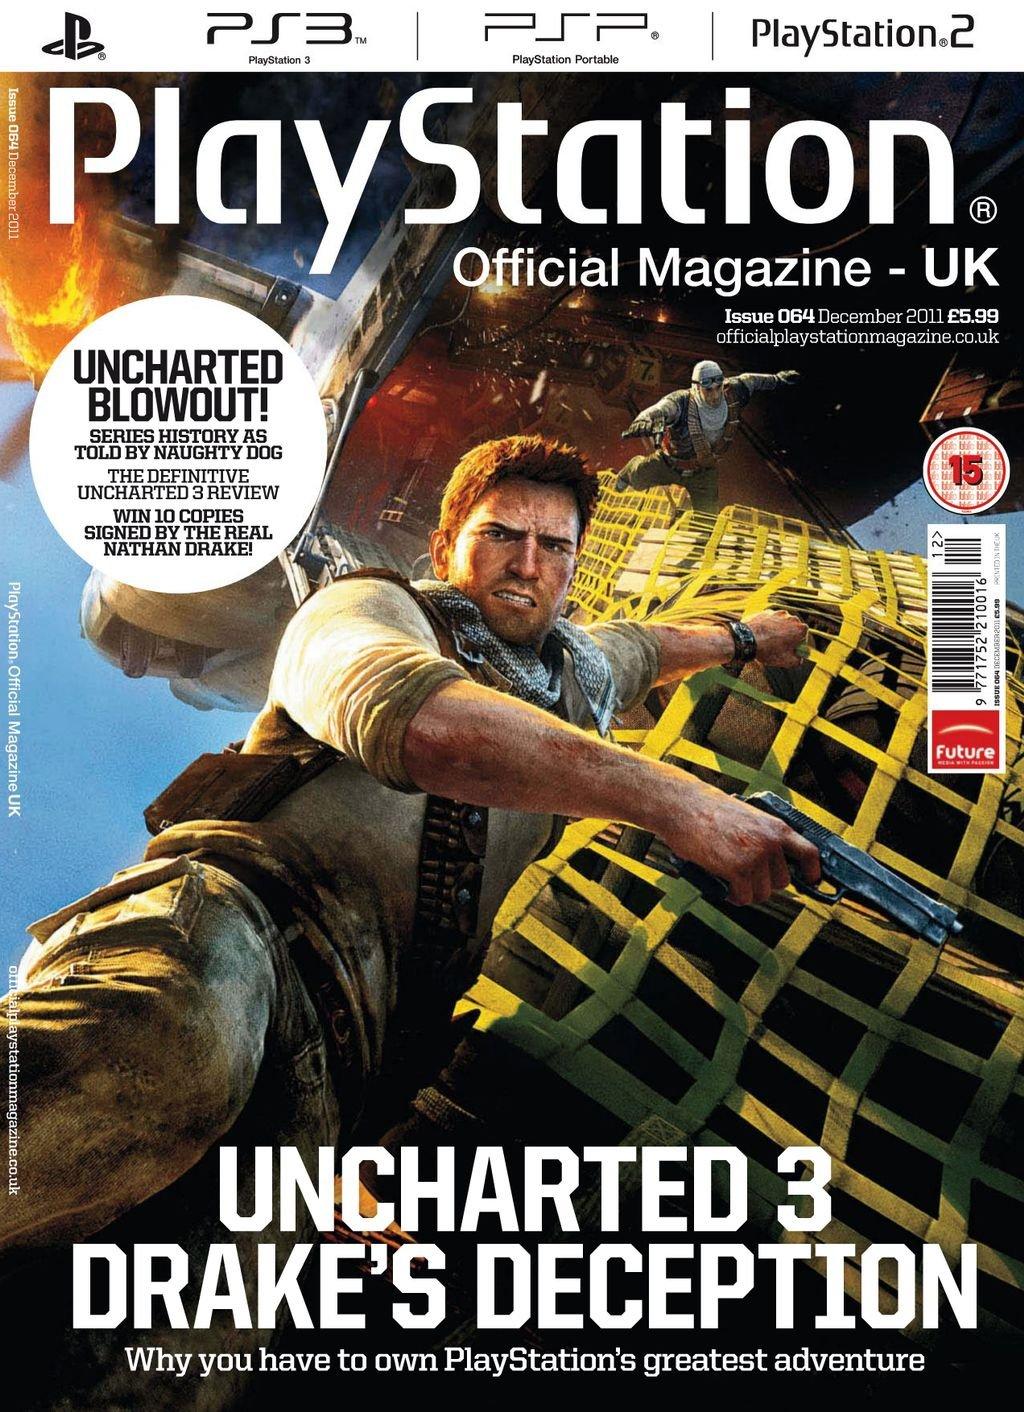 Playstation Official Magazine UK 064 (December 2011)